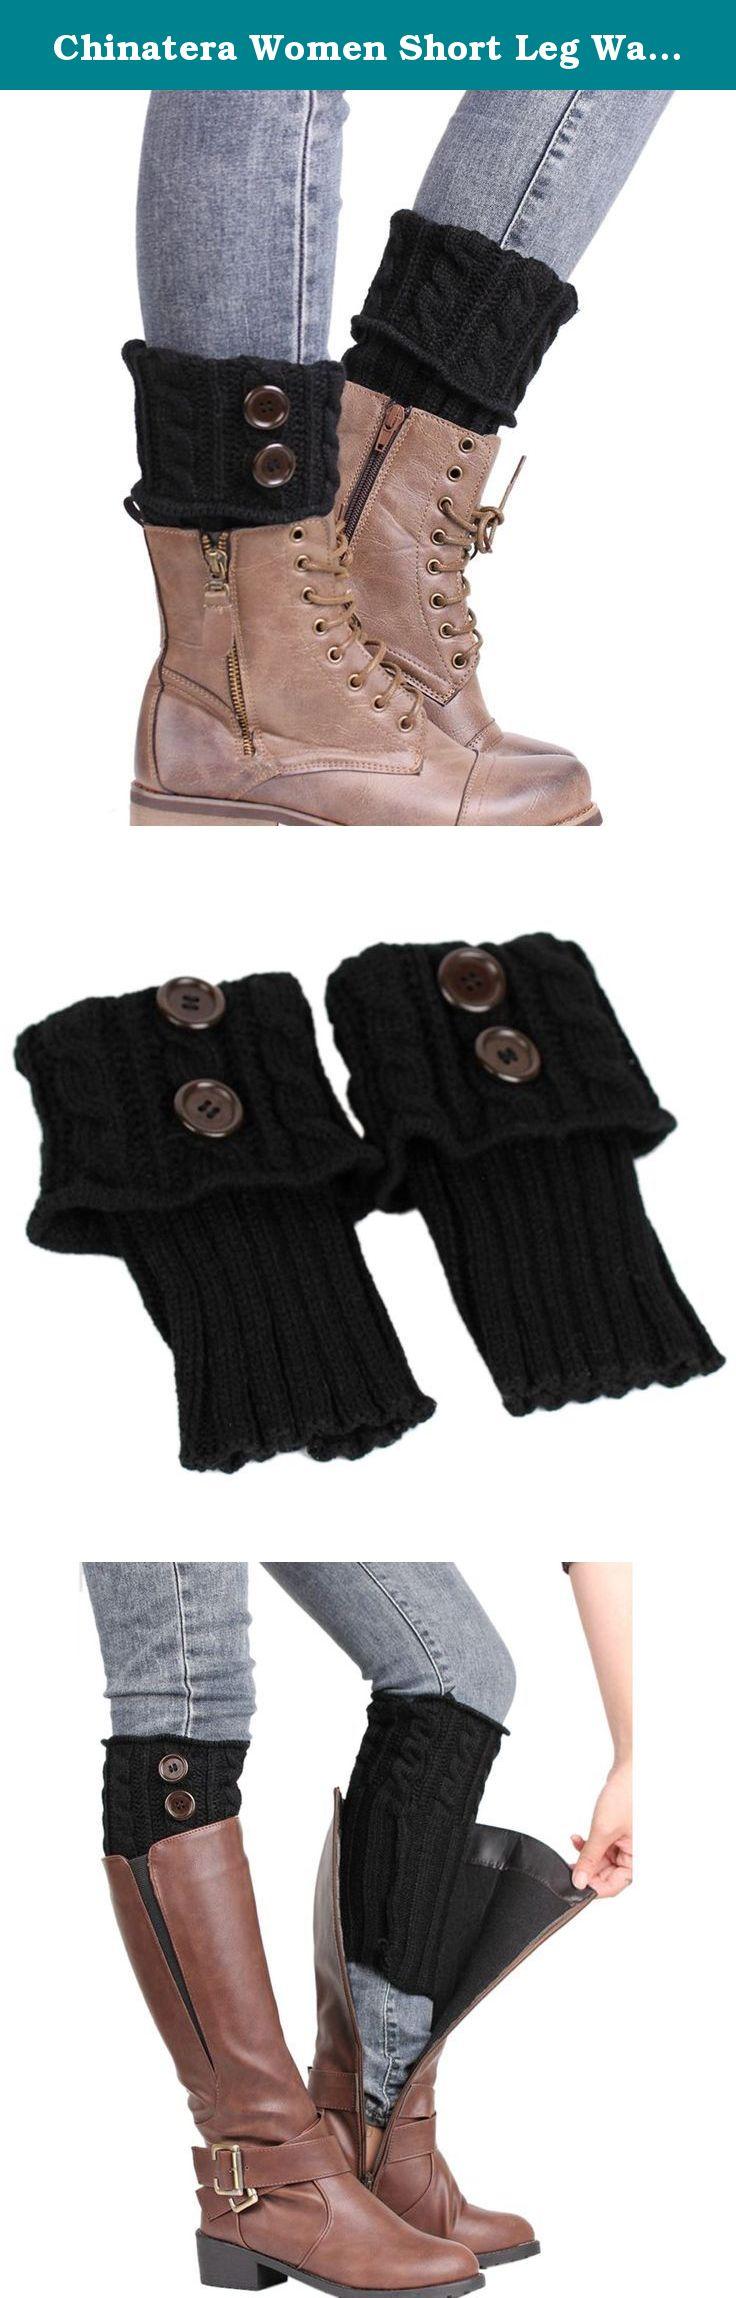 Chinatera Women Short Leg Warmers Winter Warm Button Crochet Knitted Boot Socks. Package content: 1 X Pair of Leg Warmers.